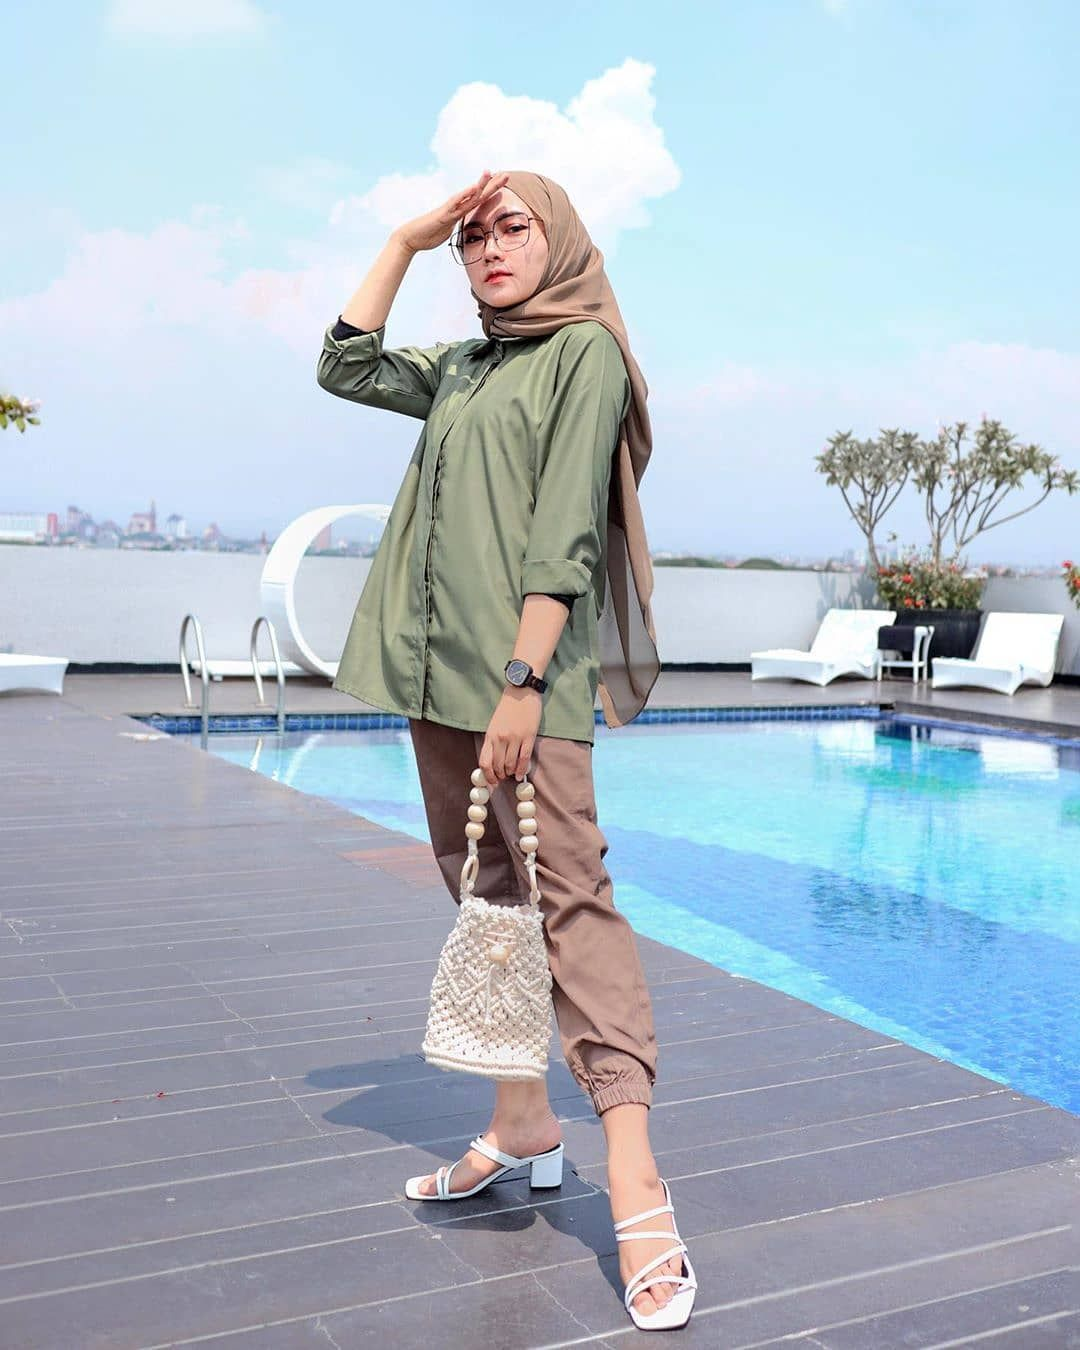 Inspiration Hijab Style Outfit Of The Day Ootd 2020 Remaja Indonesia Positif Kreatif Ceria Pakaian Pantai Gaya Berpakaian Model Pakaian Hijab